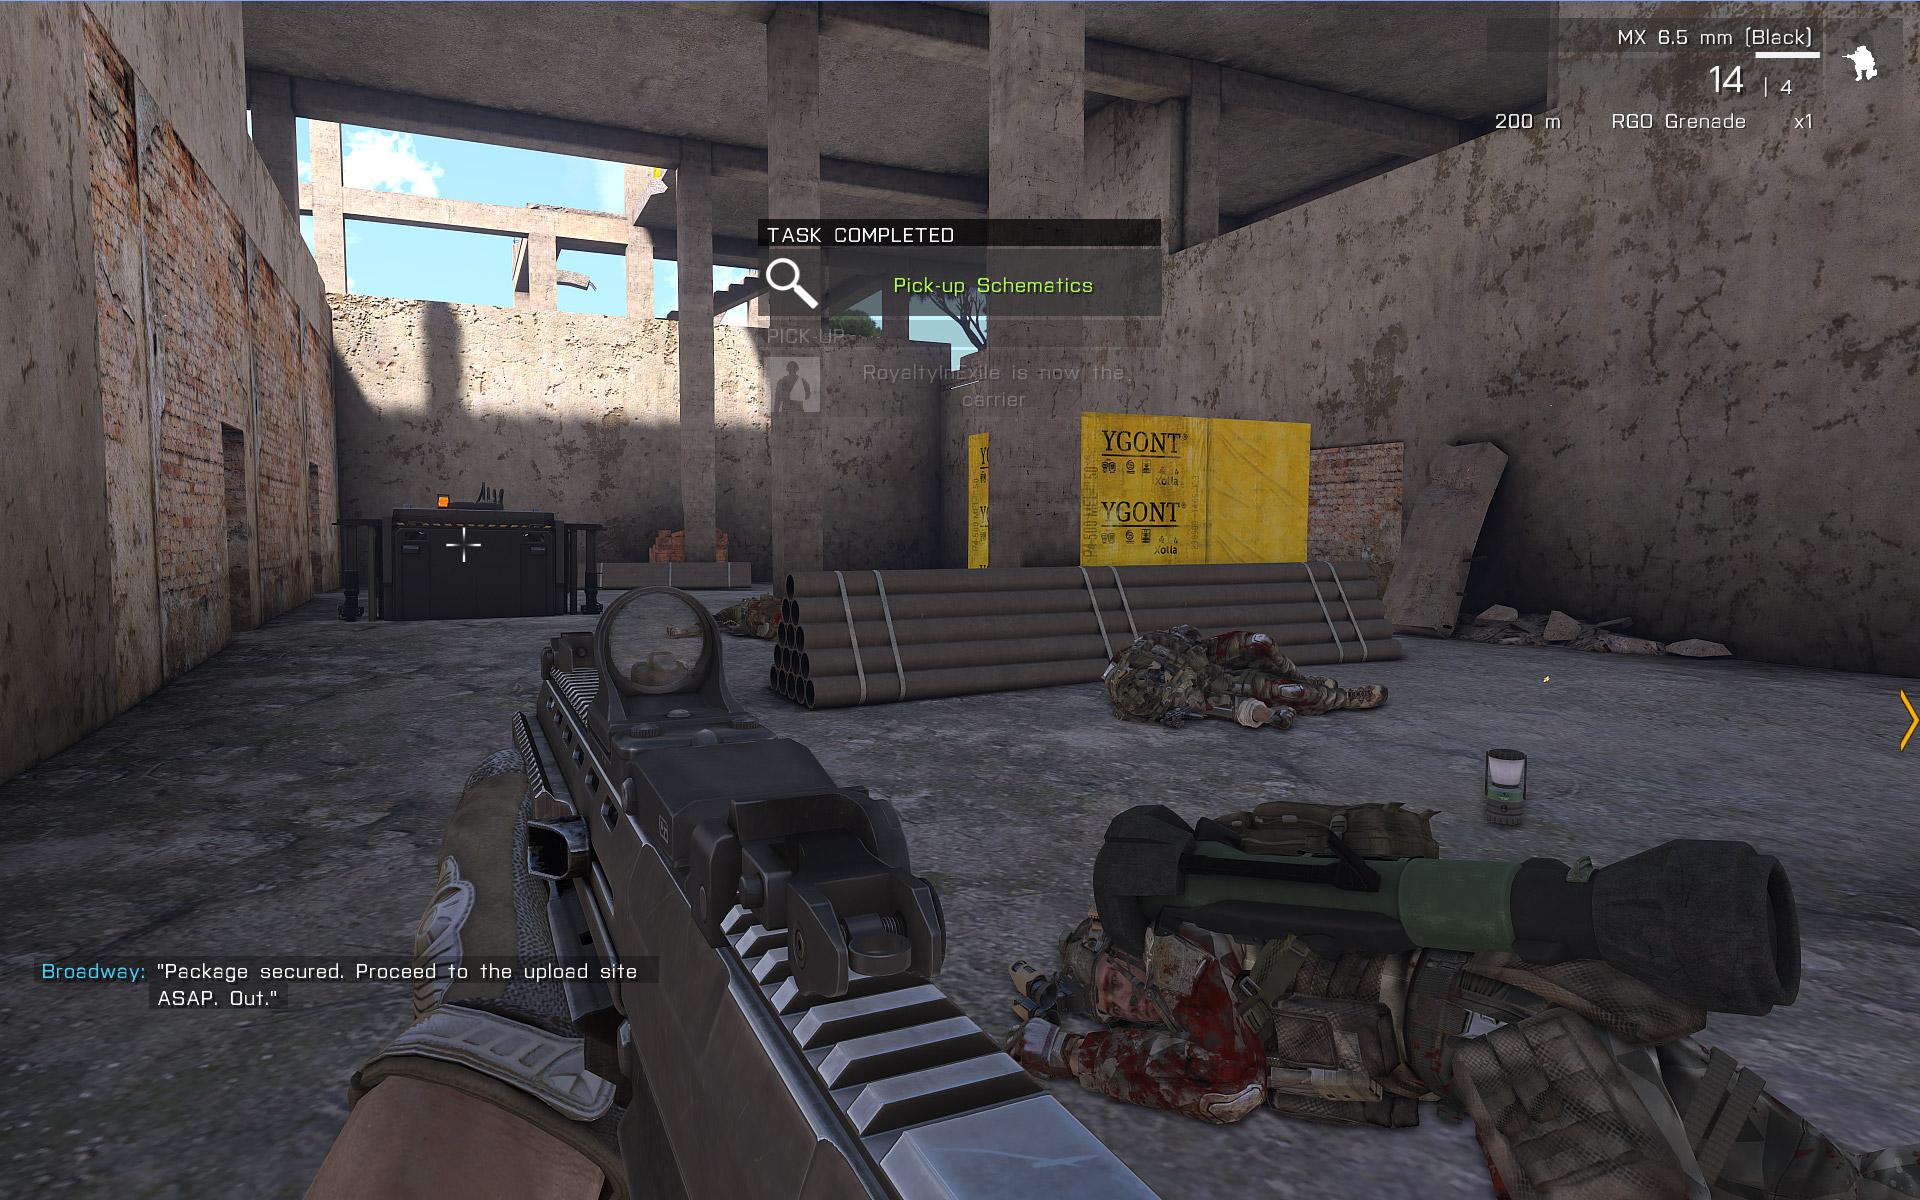 Arma 3, Arma III, Bohemia Interactive, Apex, 2015-2016